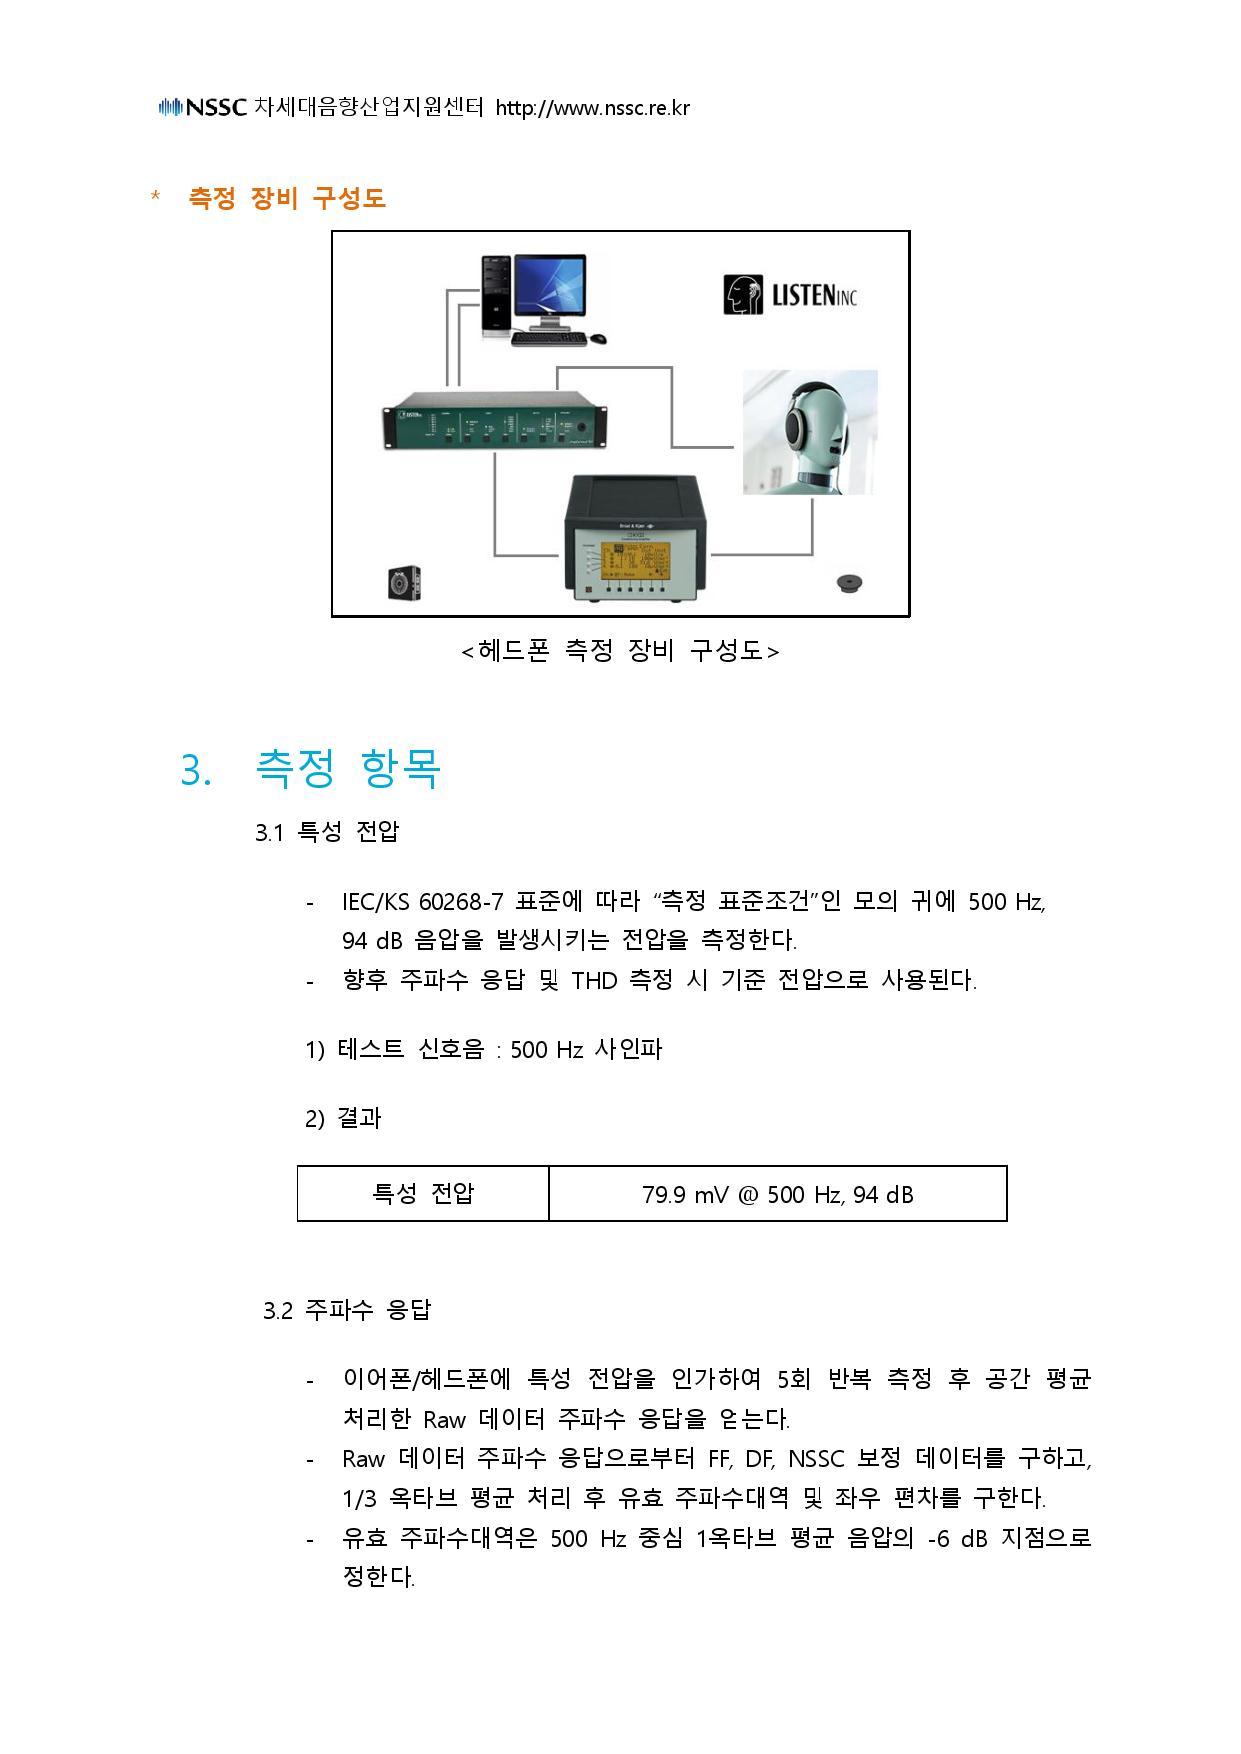 Audio-technica ATH-M50x-page-003.jpg